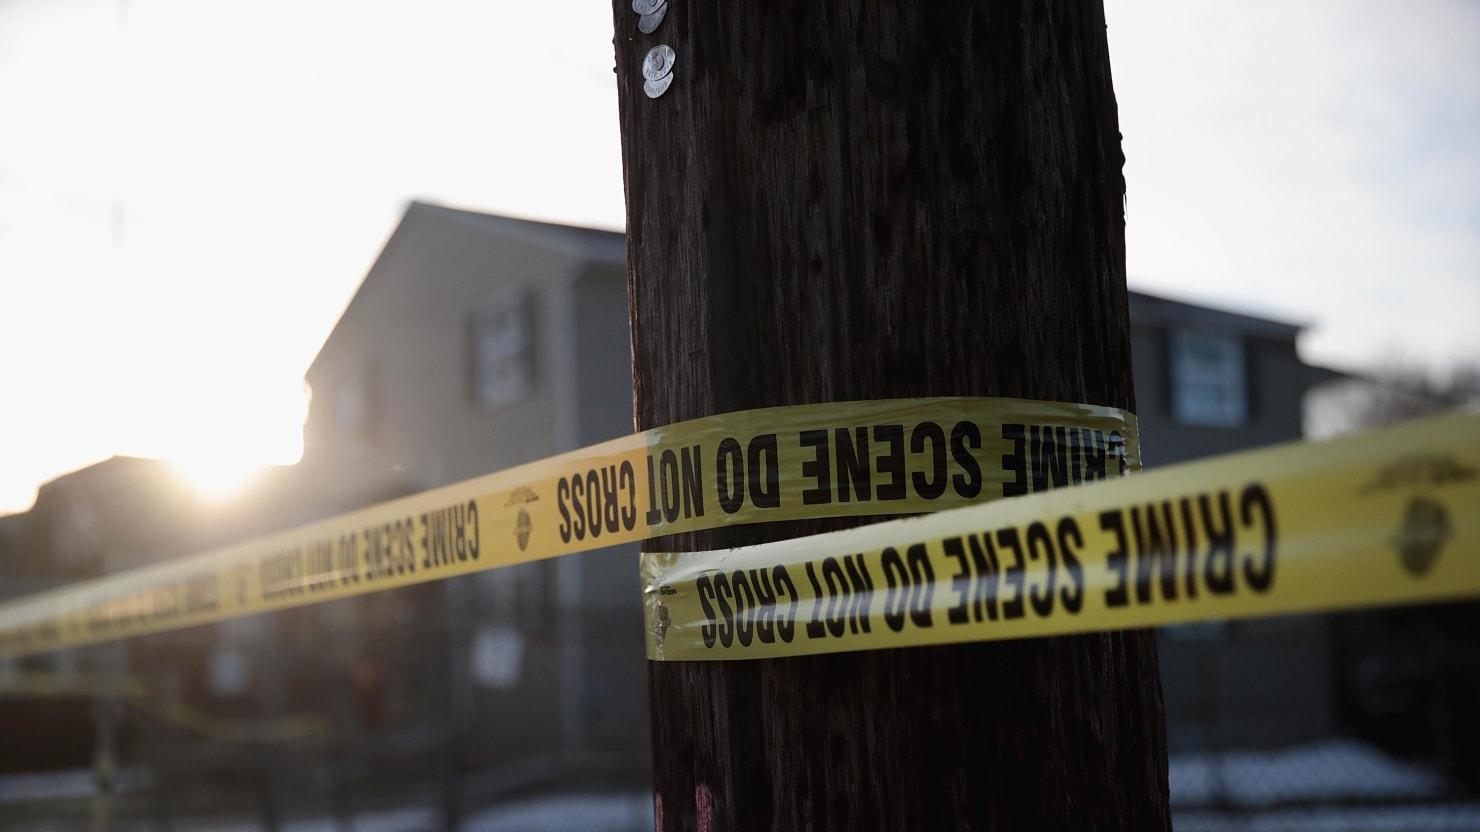 Woman Holding Baby, Gun Threatens to Blow Up San Diego Church: Cops